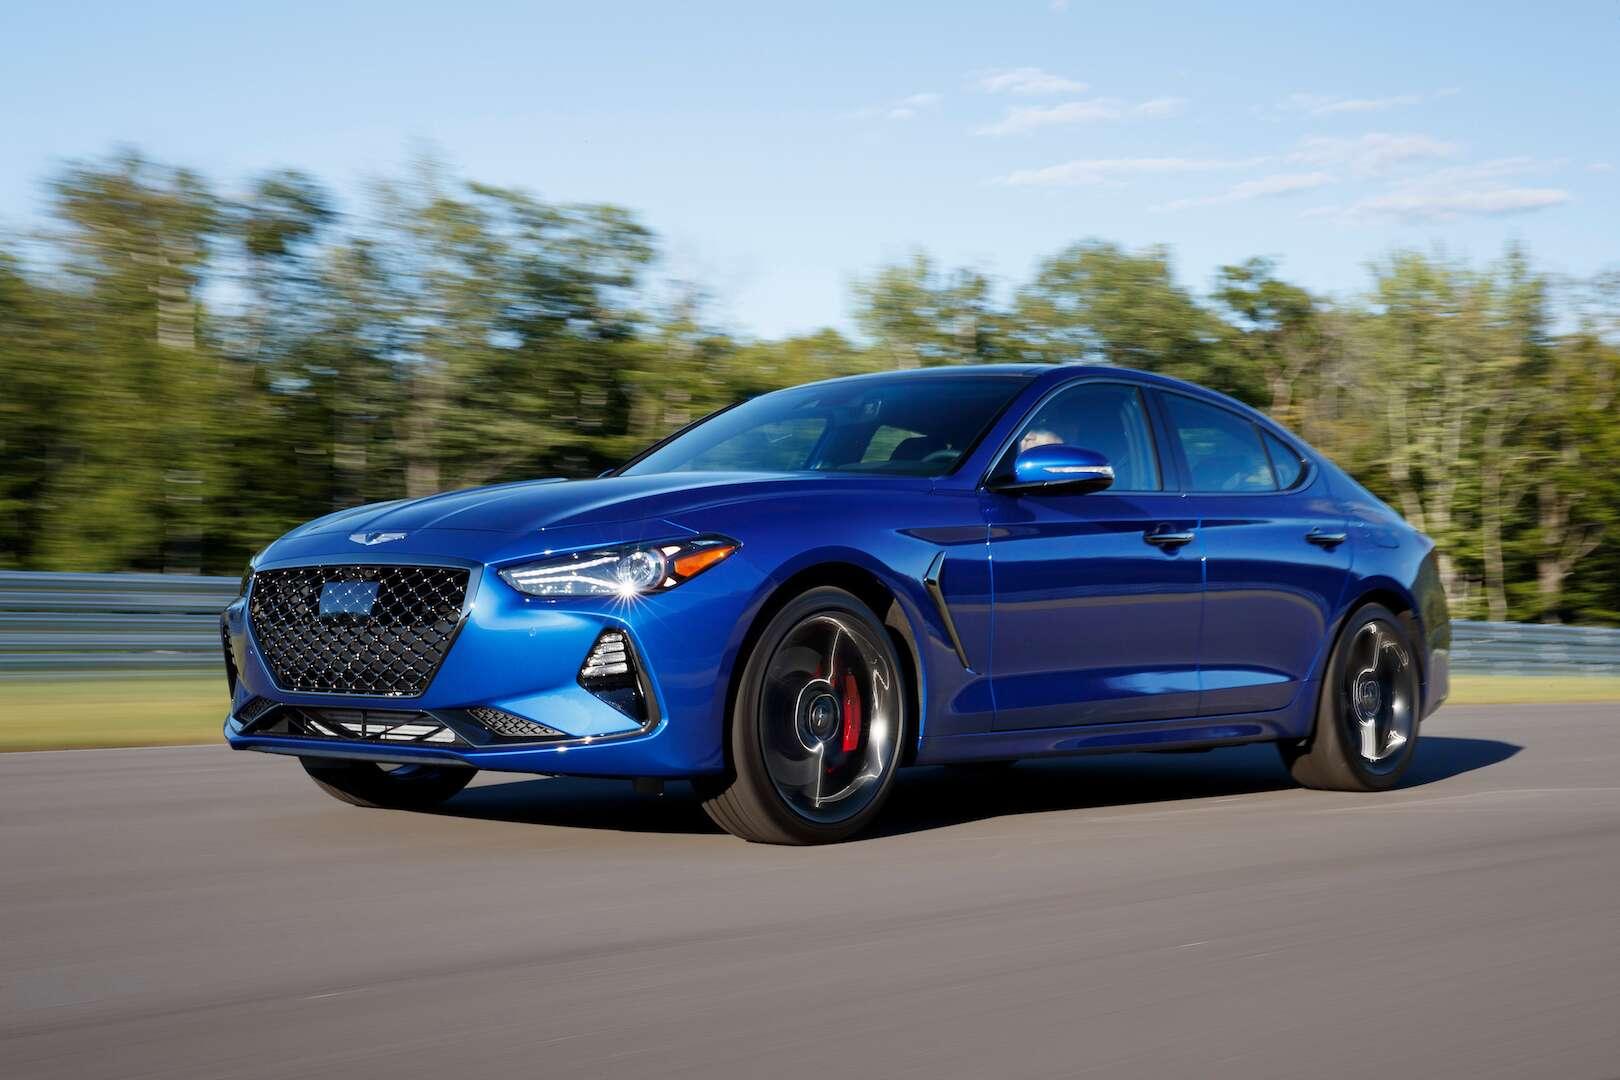 2019 Genesis G70 Test Drive Review: Hyundai's Luxury Brand ...